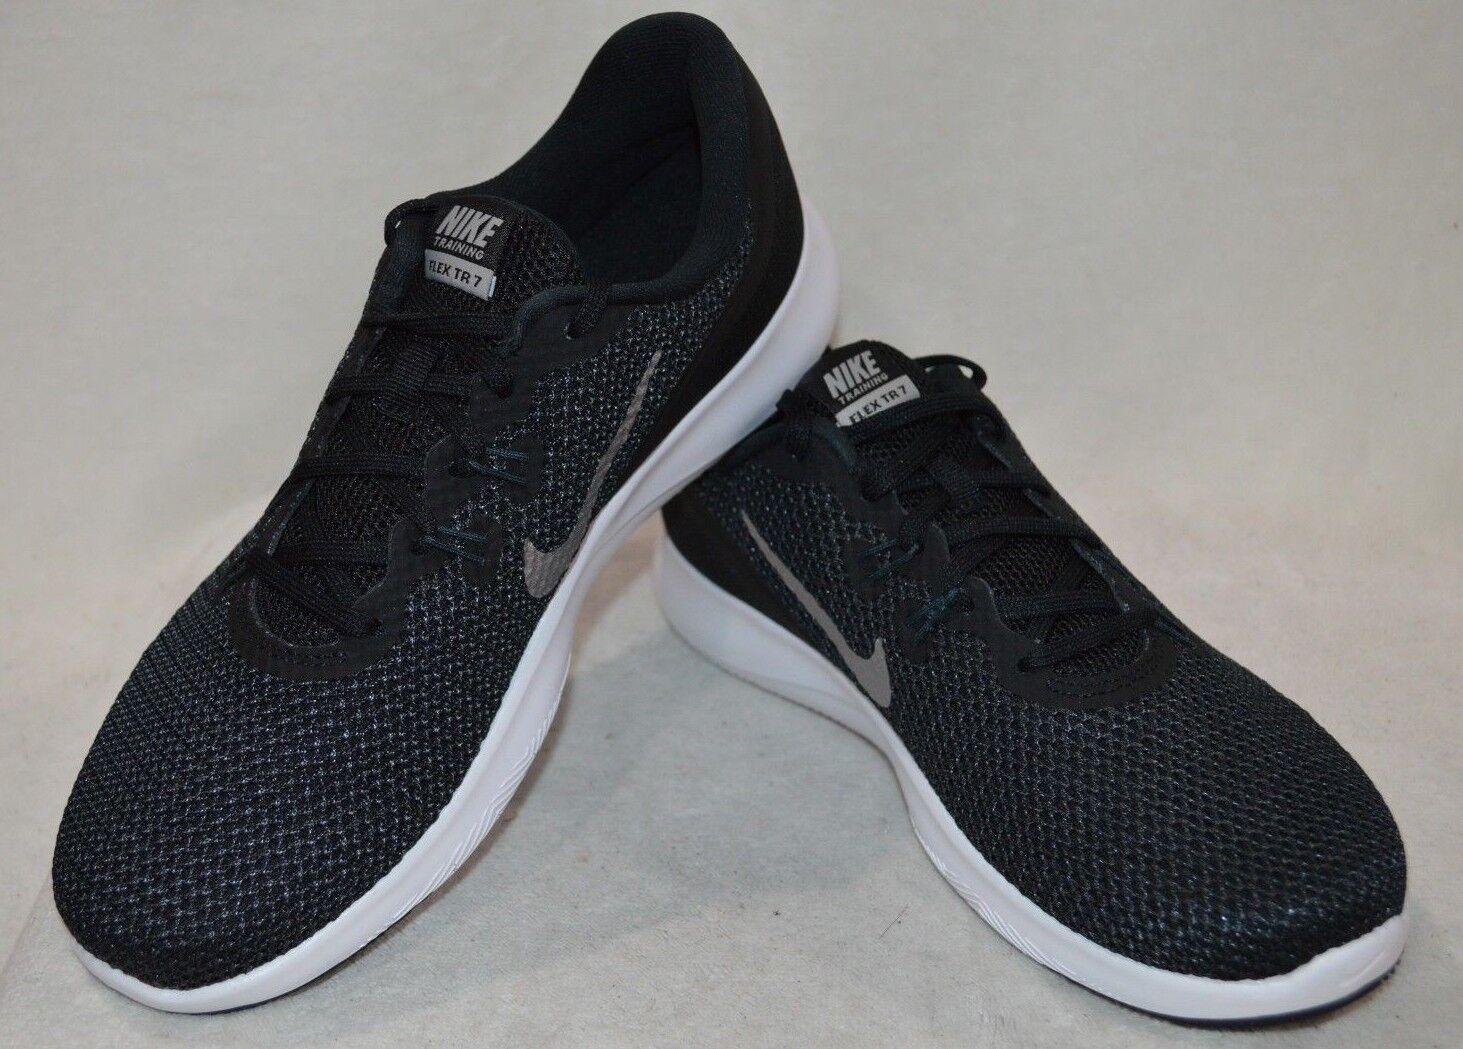 Nike Flex Trainer 7 Black/Silver Women's Cross-Trainers Shoes-Asst Size WIDE NWB